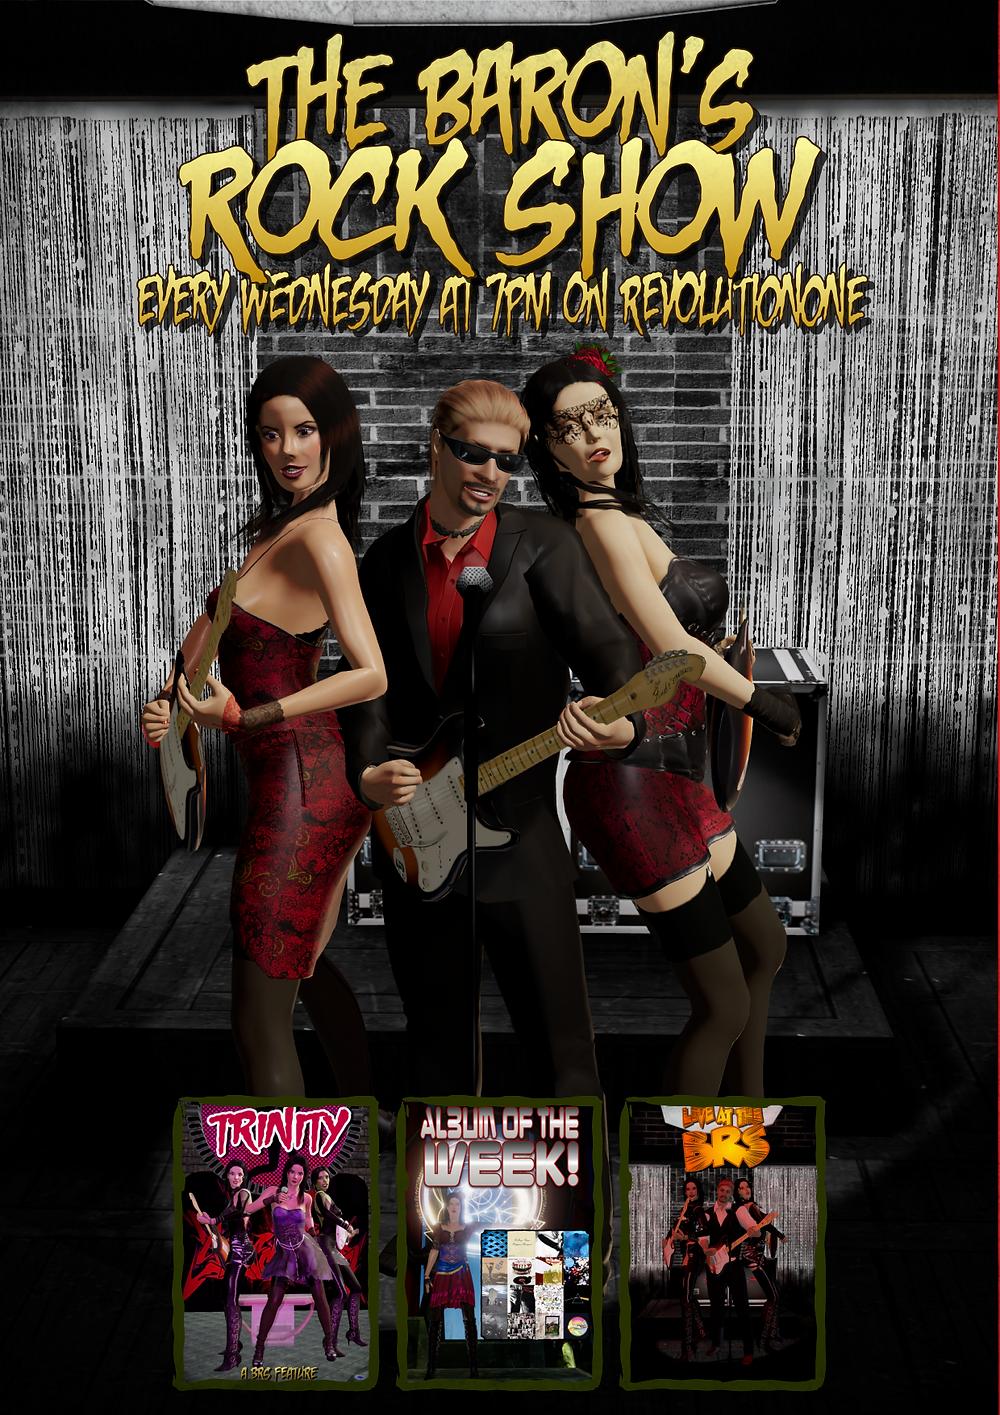 Promo for The Baron's Rock Show on revolutionradio.online